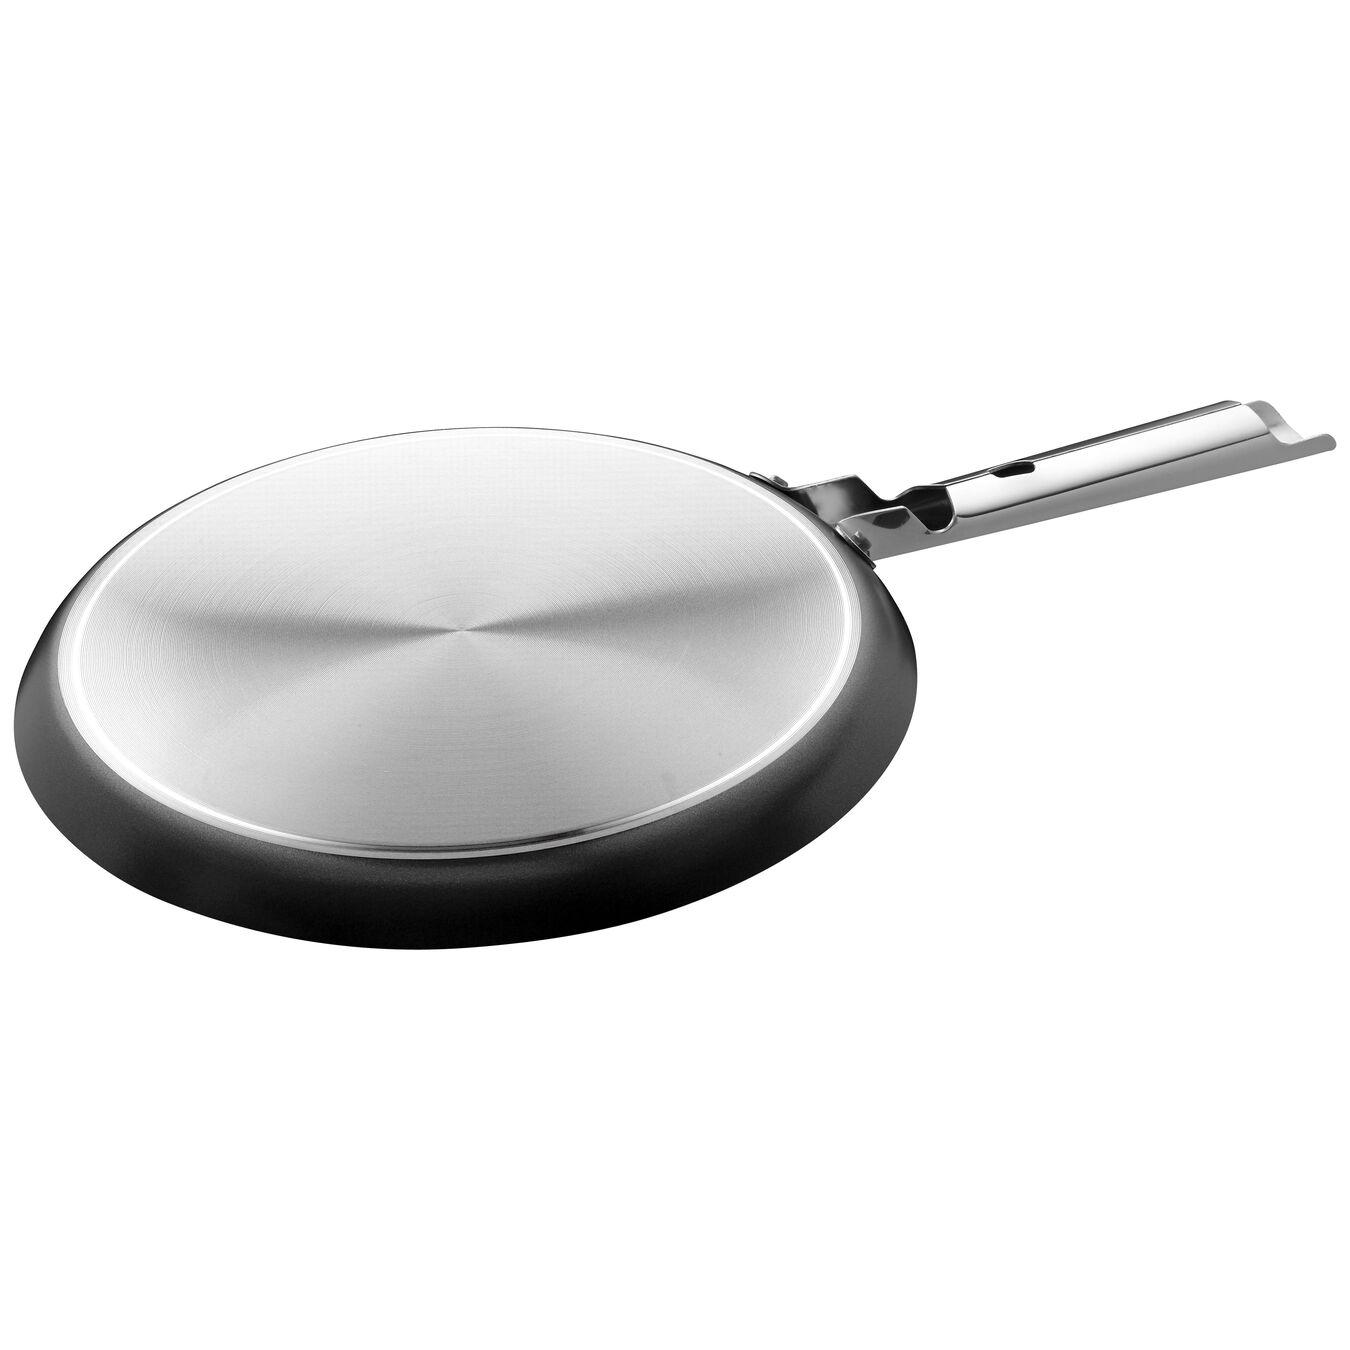 25 cm Aluminum Pancake pan,,large 4